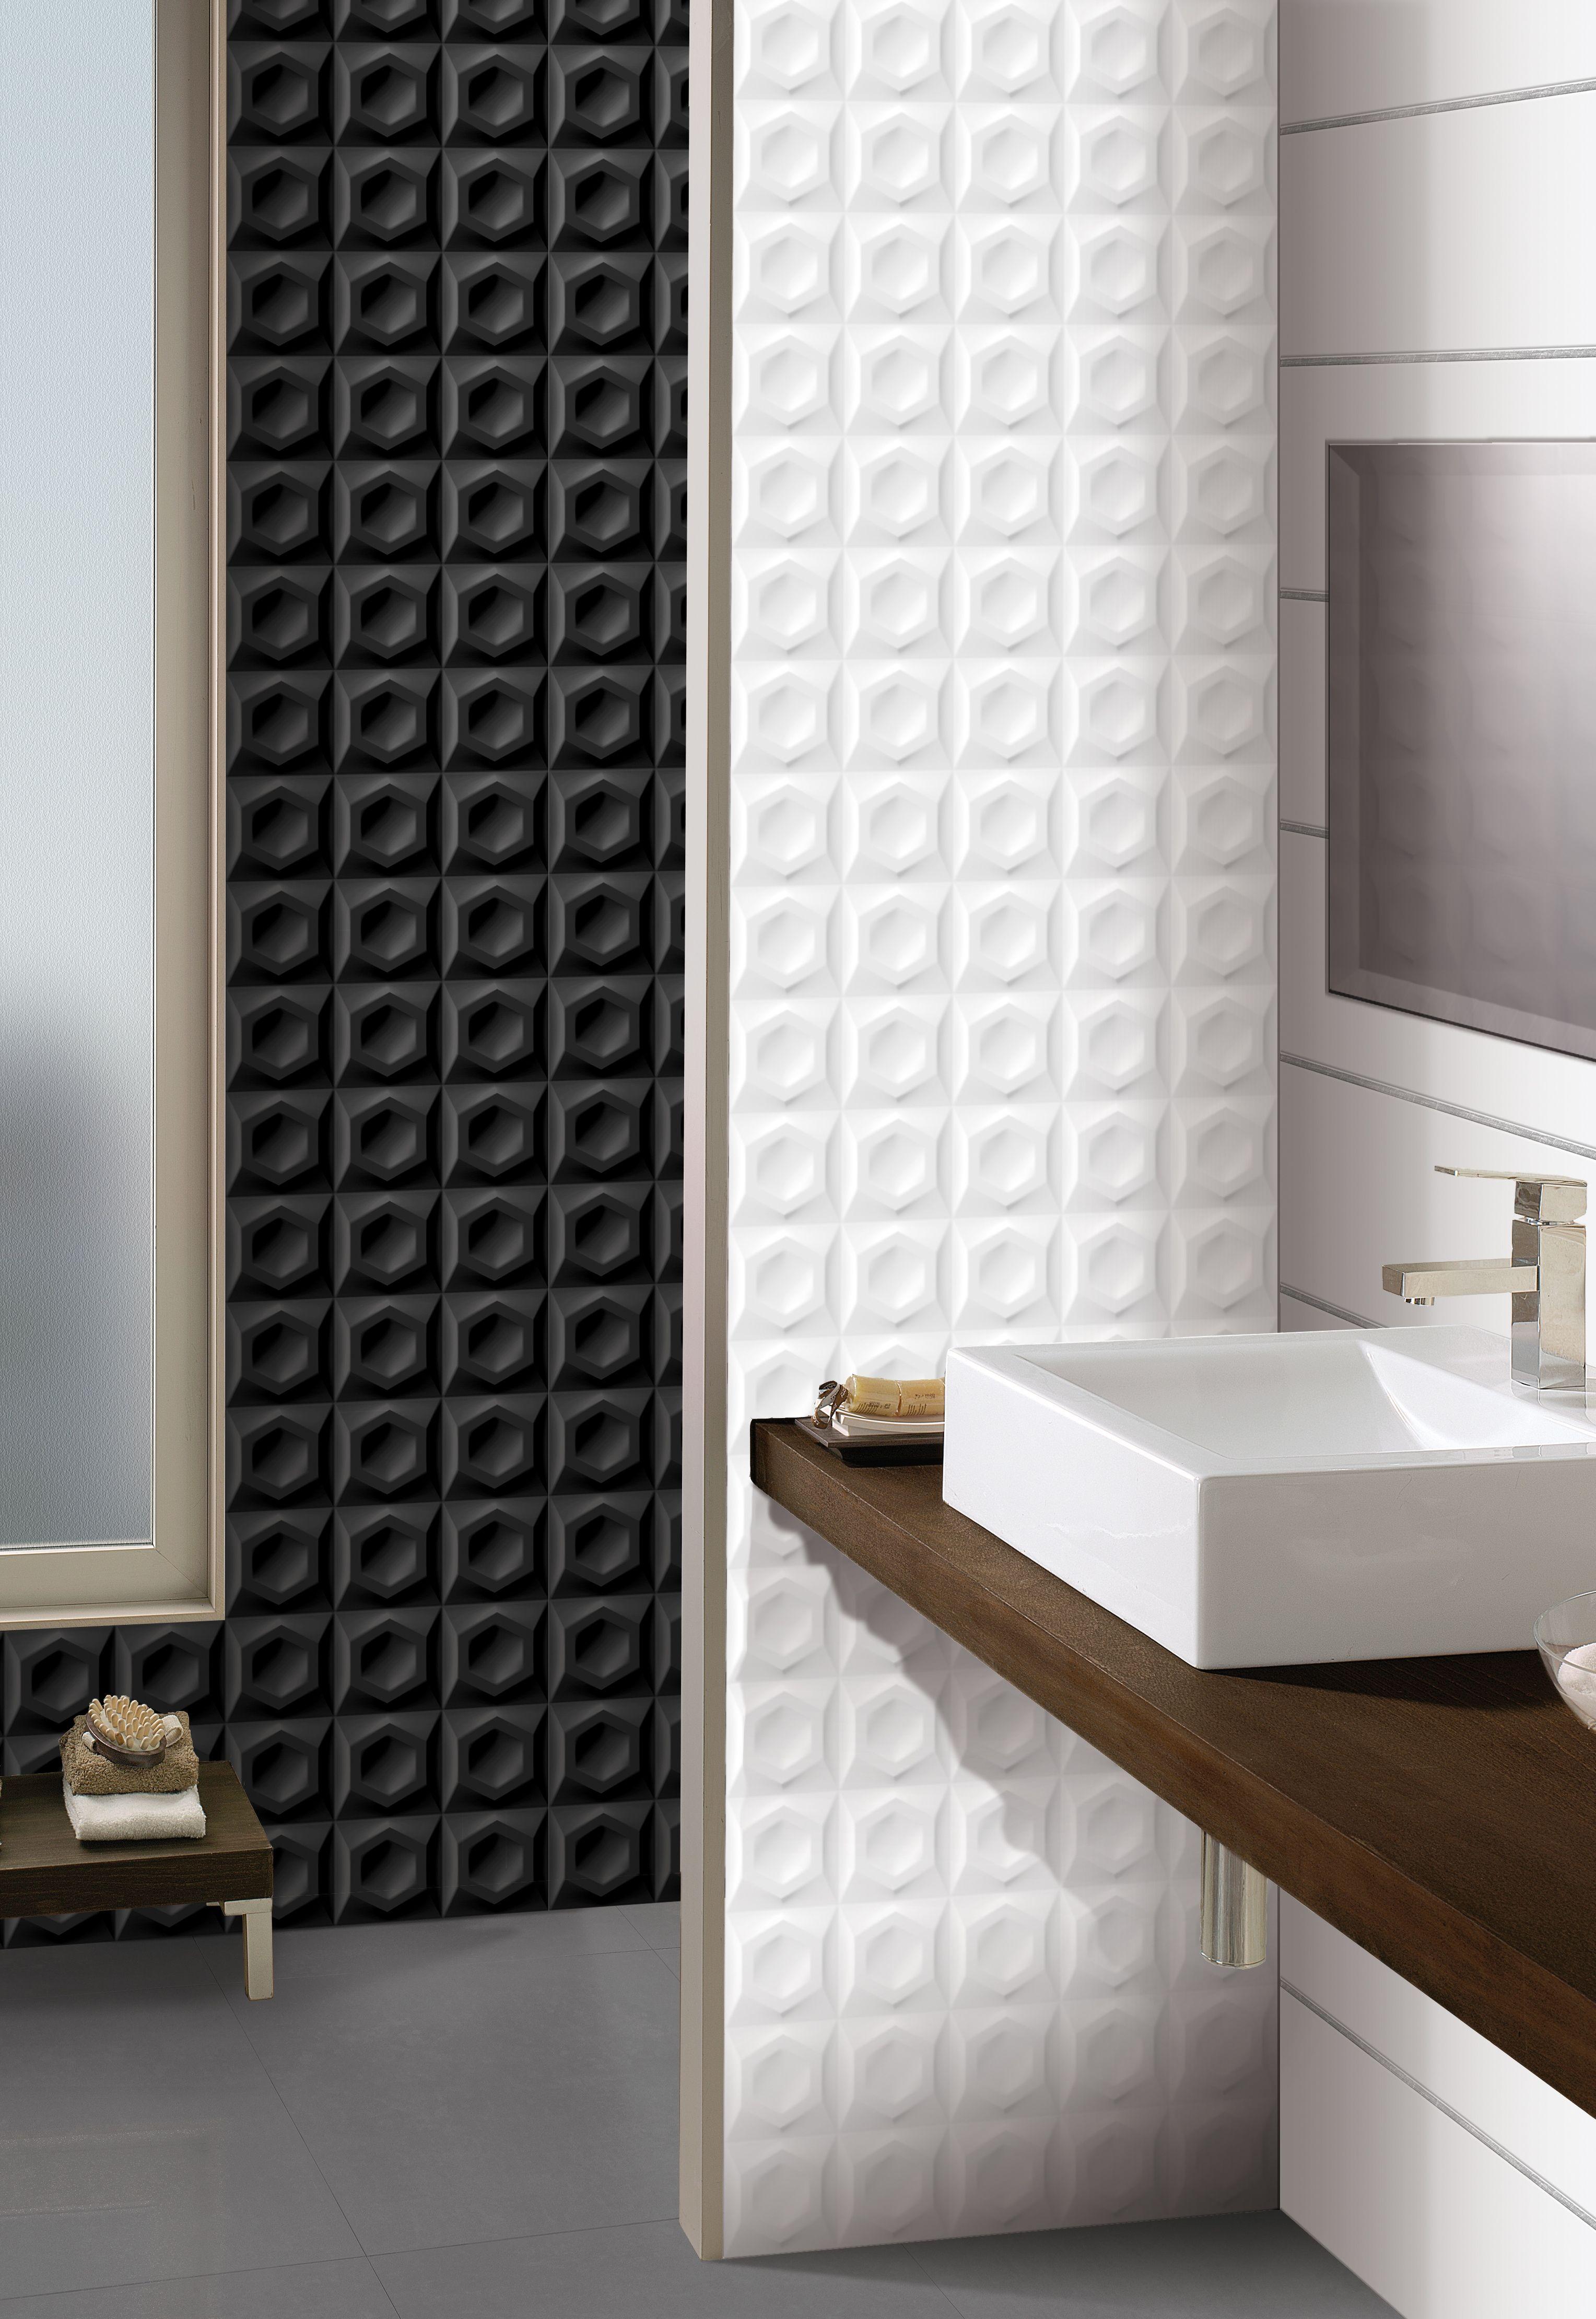 Foster - 250x750mm tile. Comes in black or white. Glazed ceramic ...